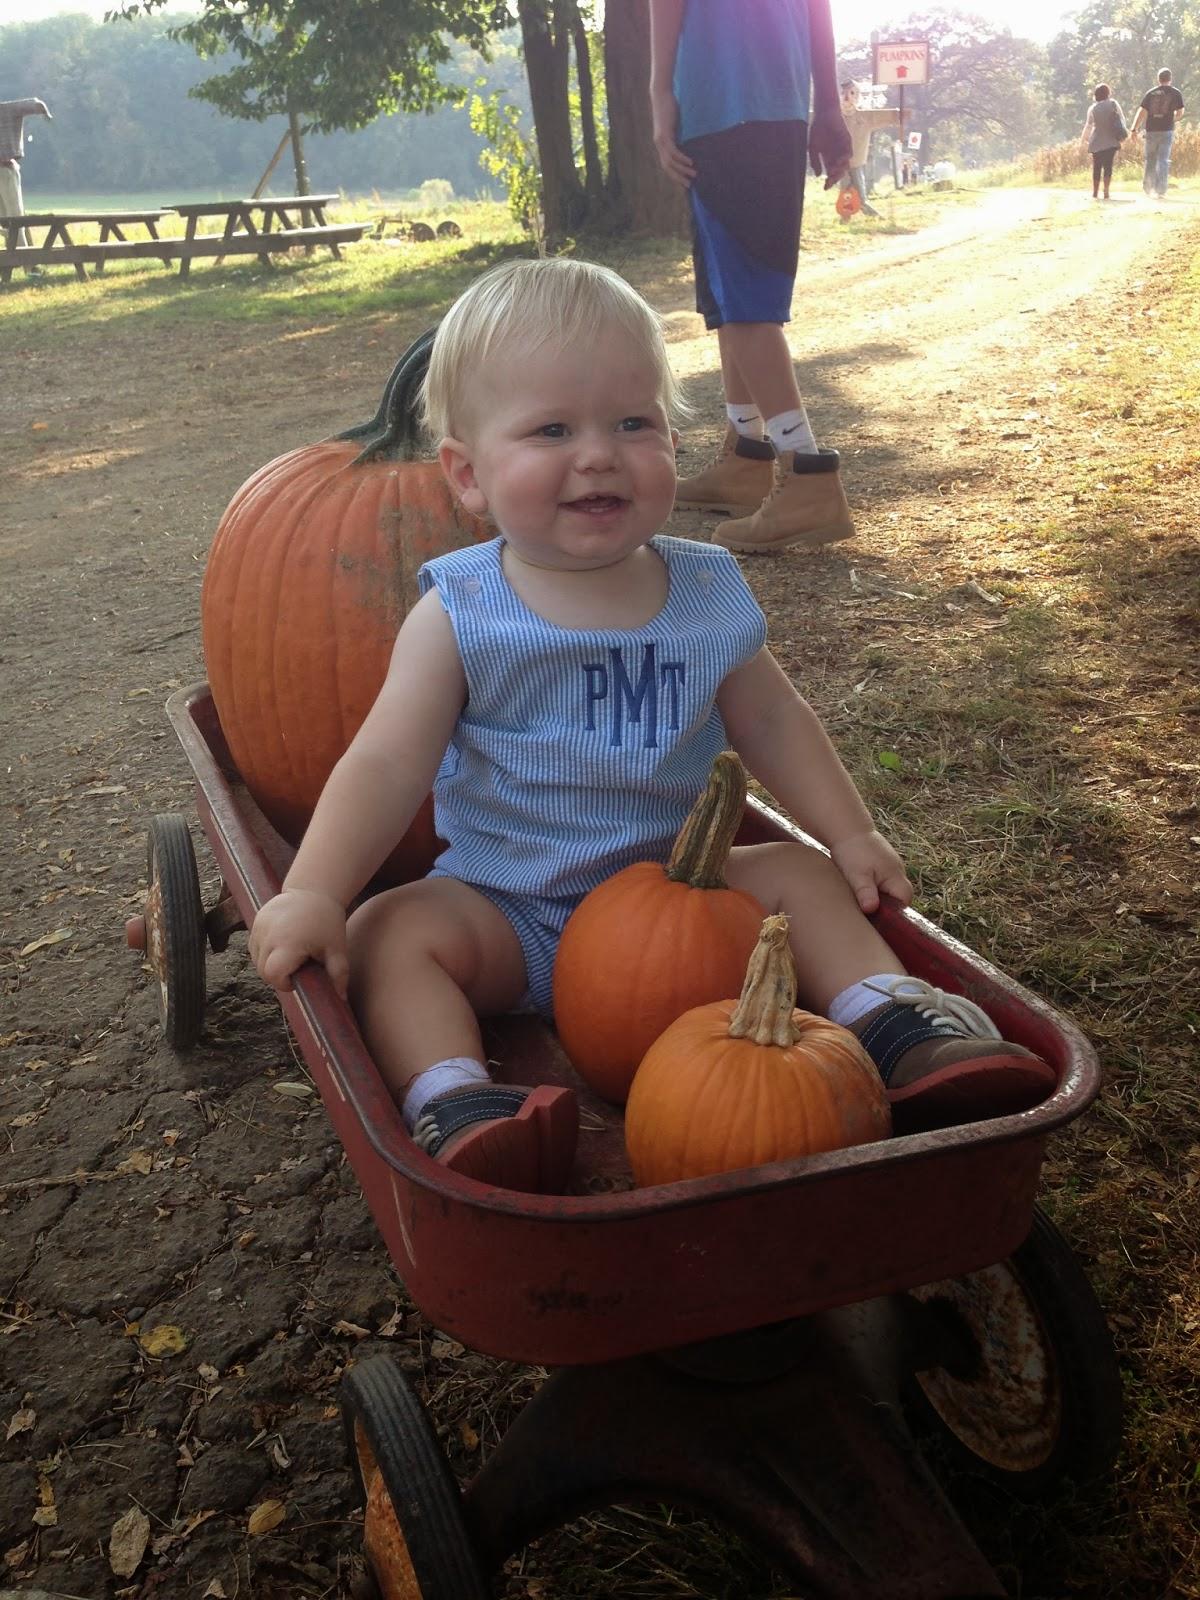 jptrans.naver.net And wagons, and pumpkins!